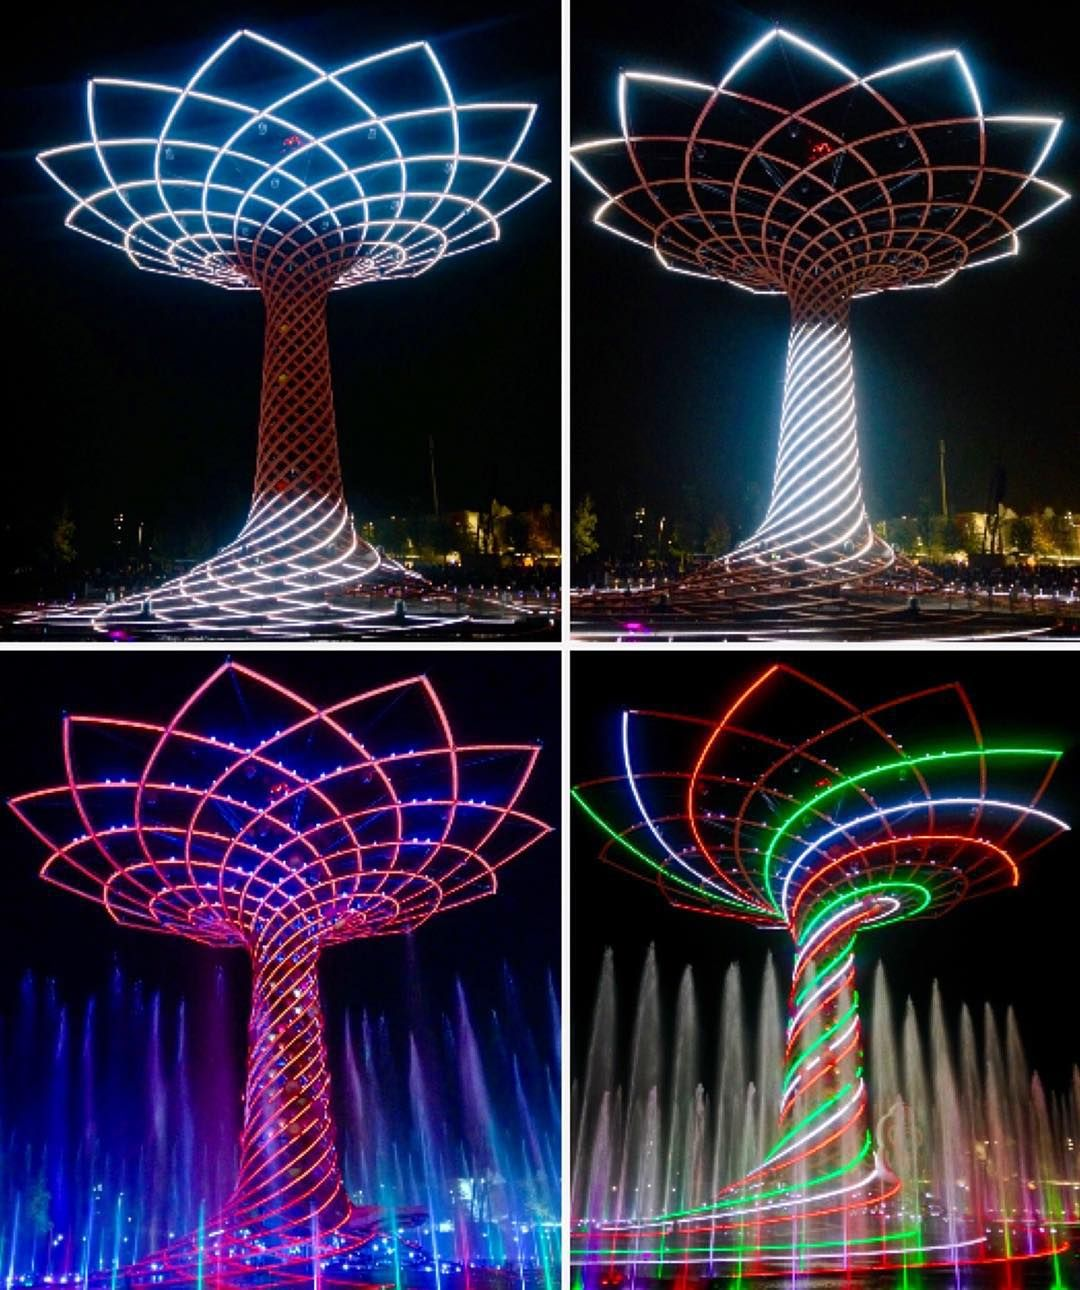 Così vario l'albero della vita / Такое разное дерево жизни  by nataly_rigvava